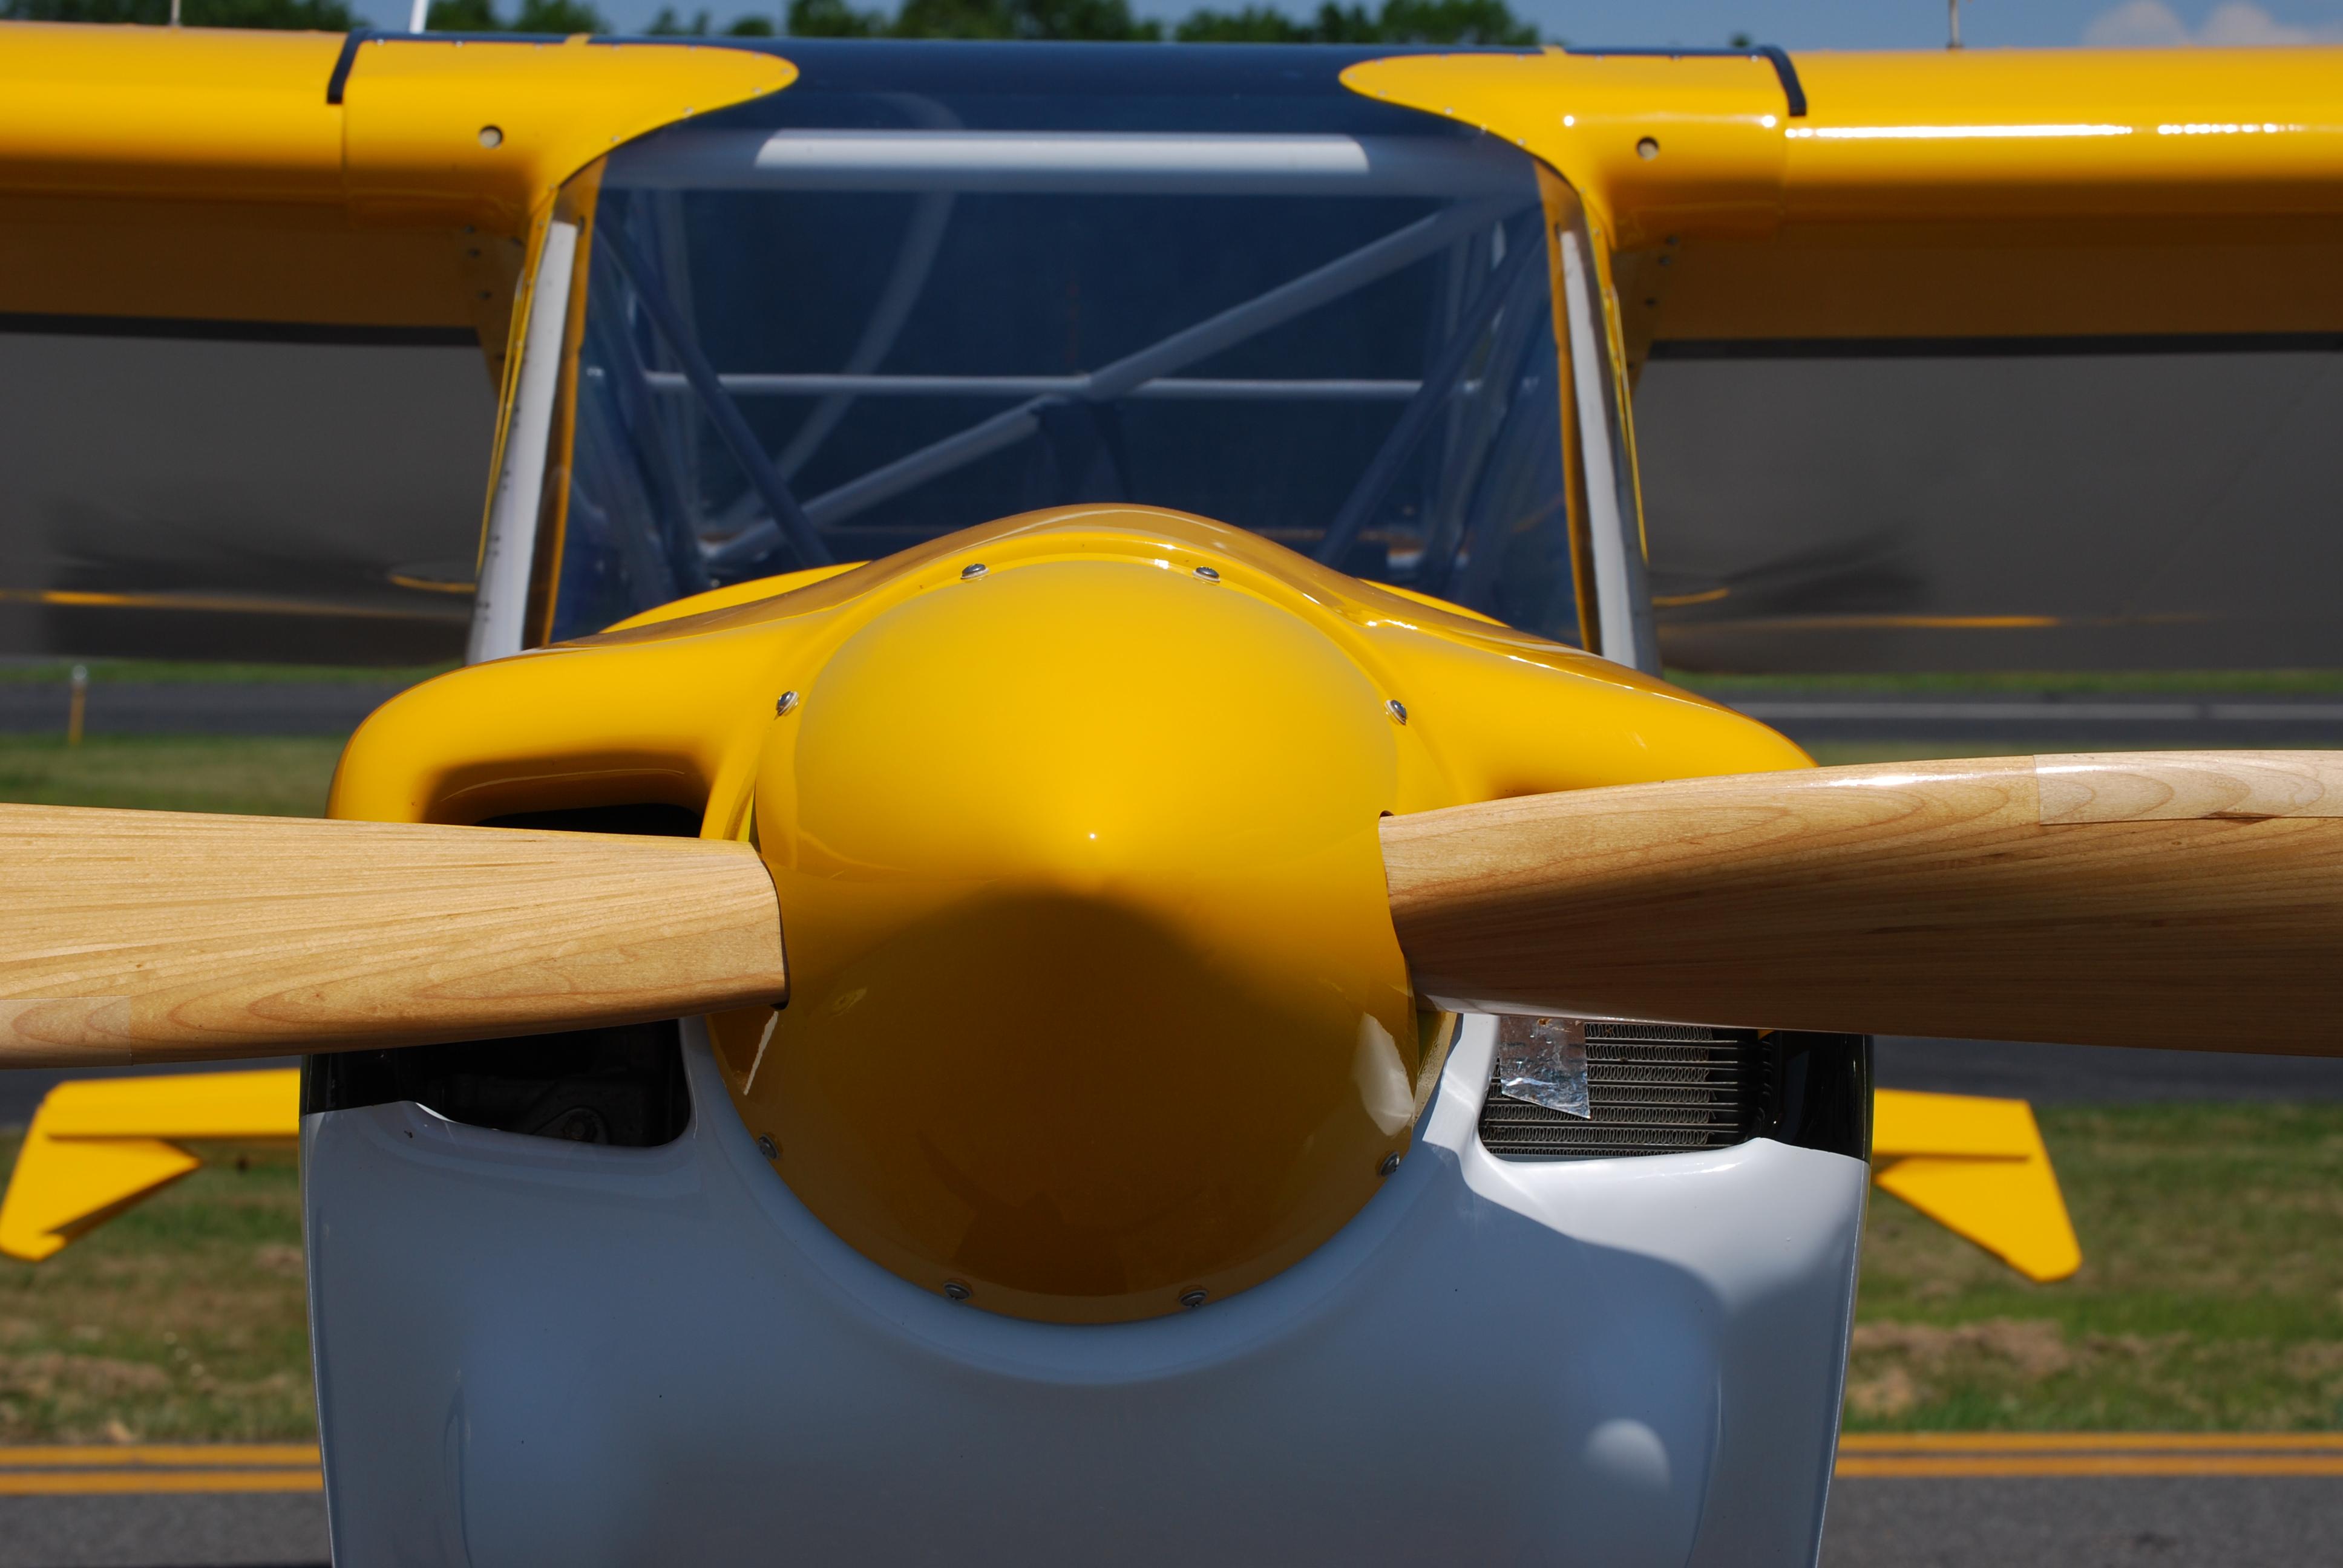 Airplane, Engine, Metallic, Motor, Propeller, HQ Photo